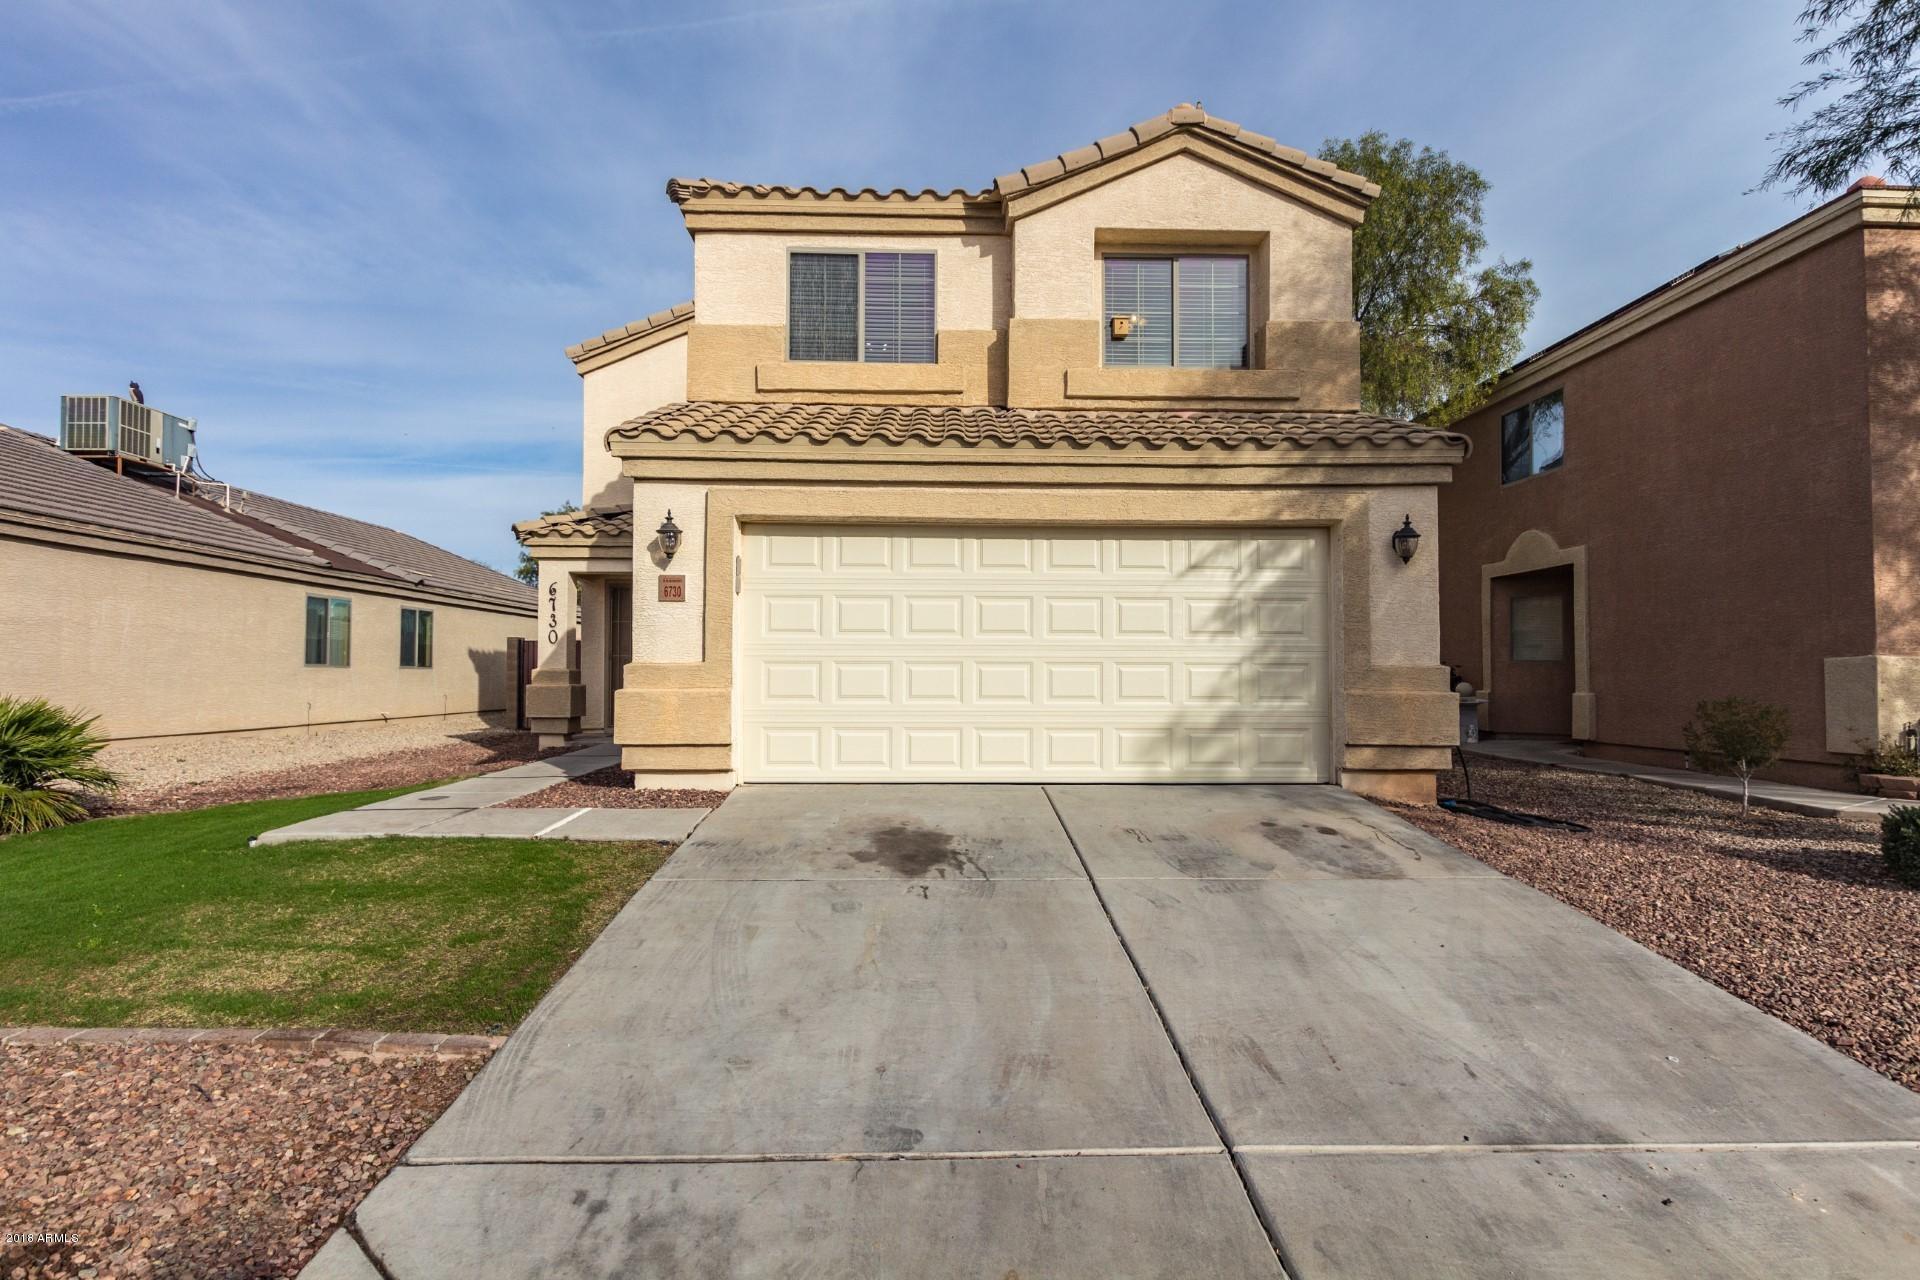 Photo for 6730 E Shamrock Street, Florence, AZ 85132 (MLS # 5854058)